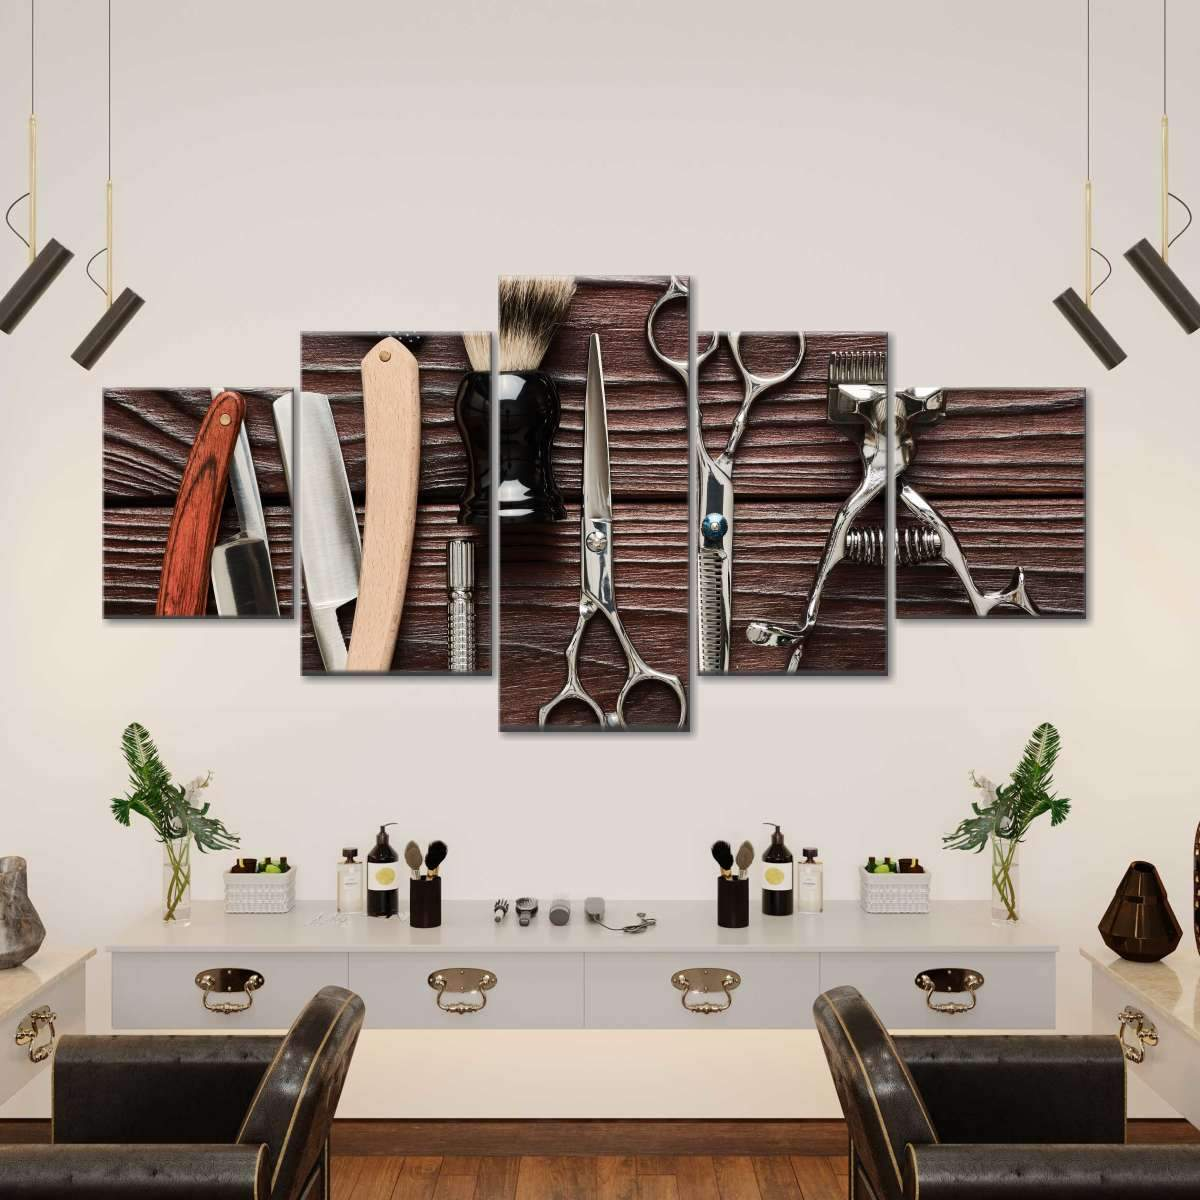 Lifestyle Barbershop Multi Panel Canvas Wall Art